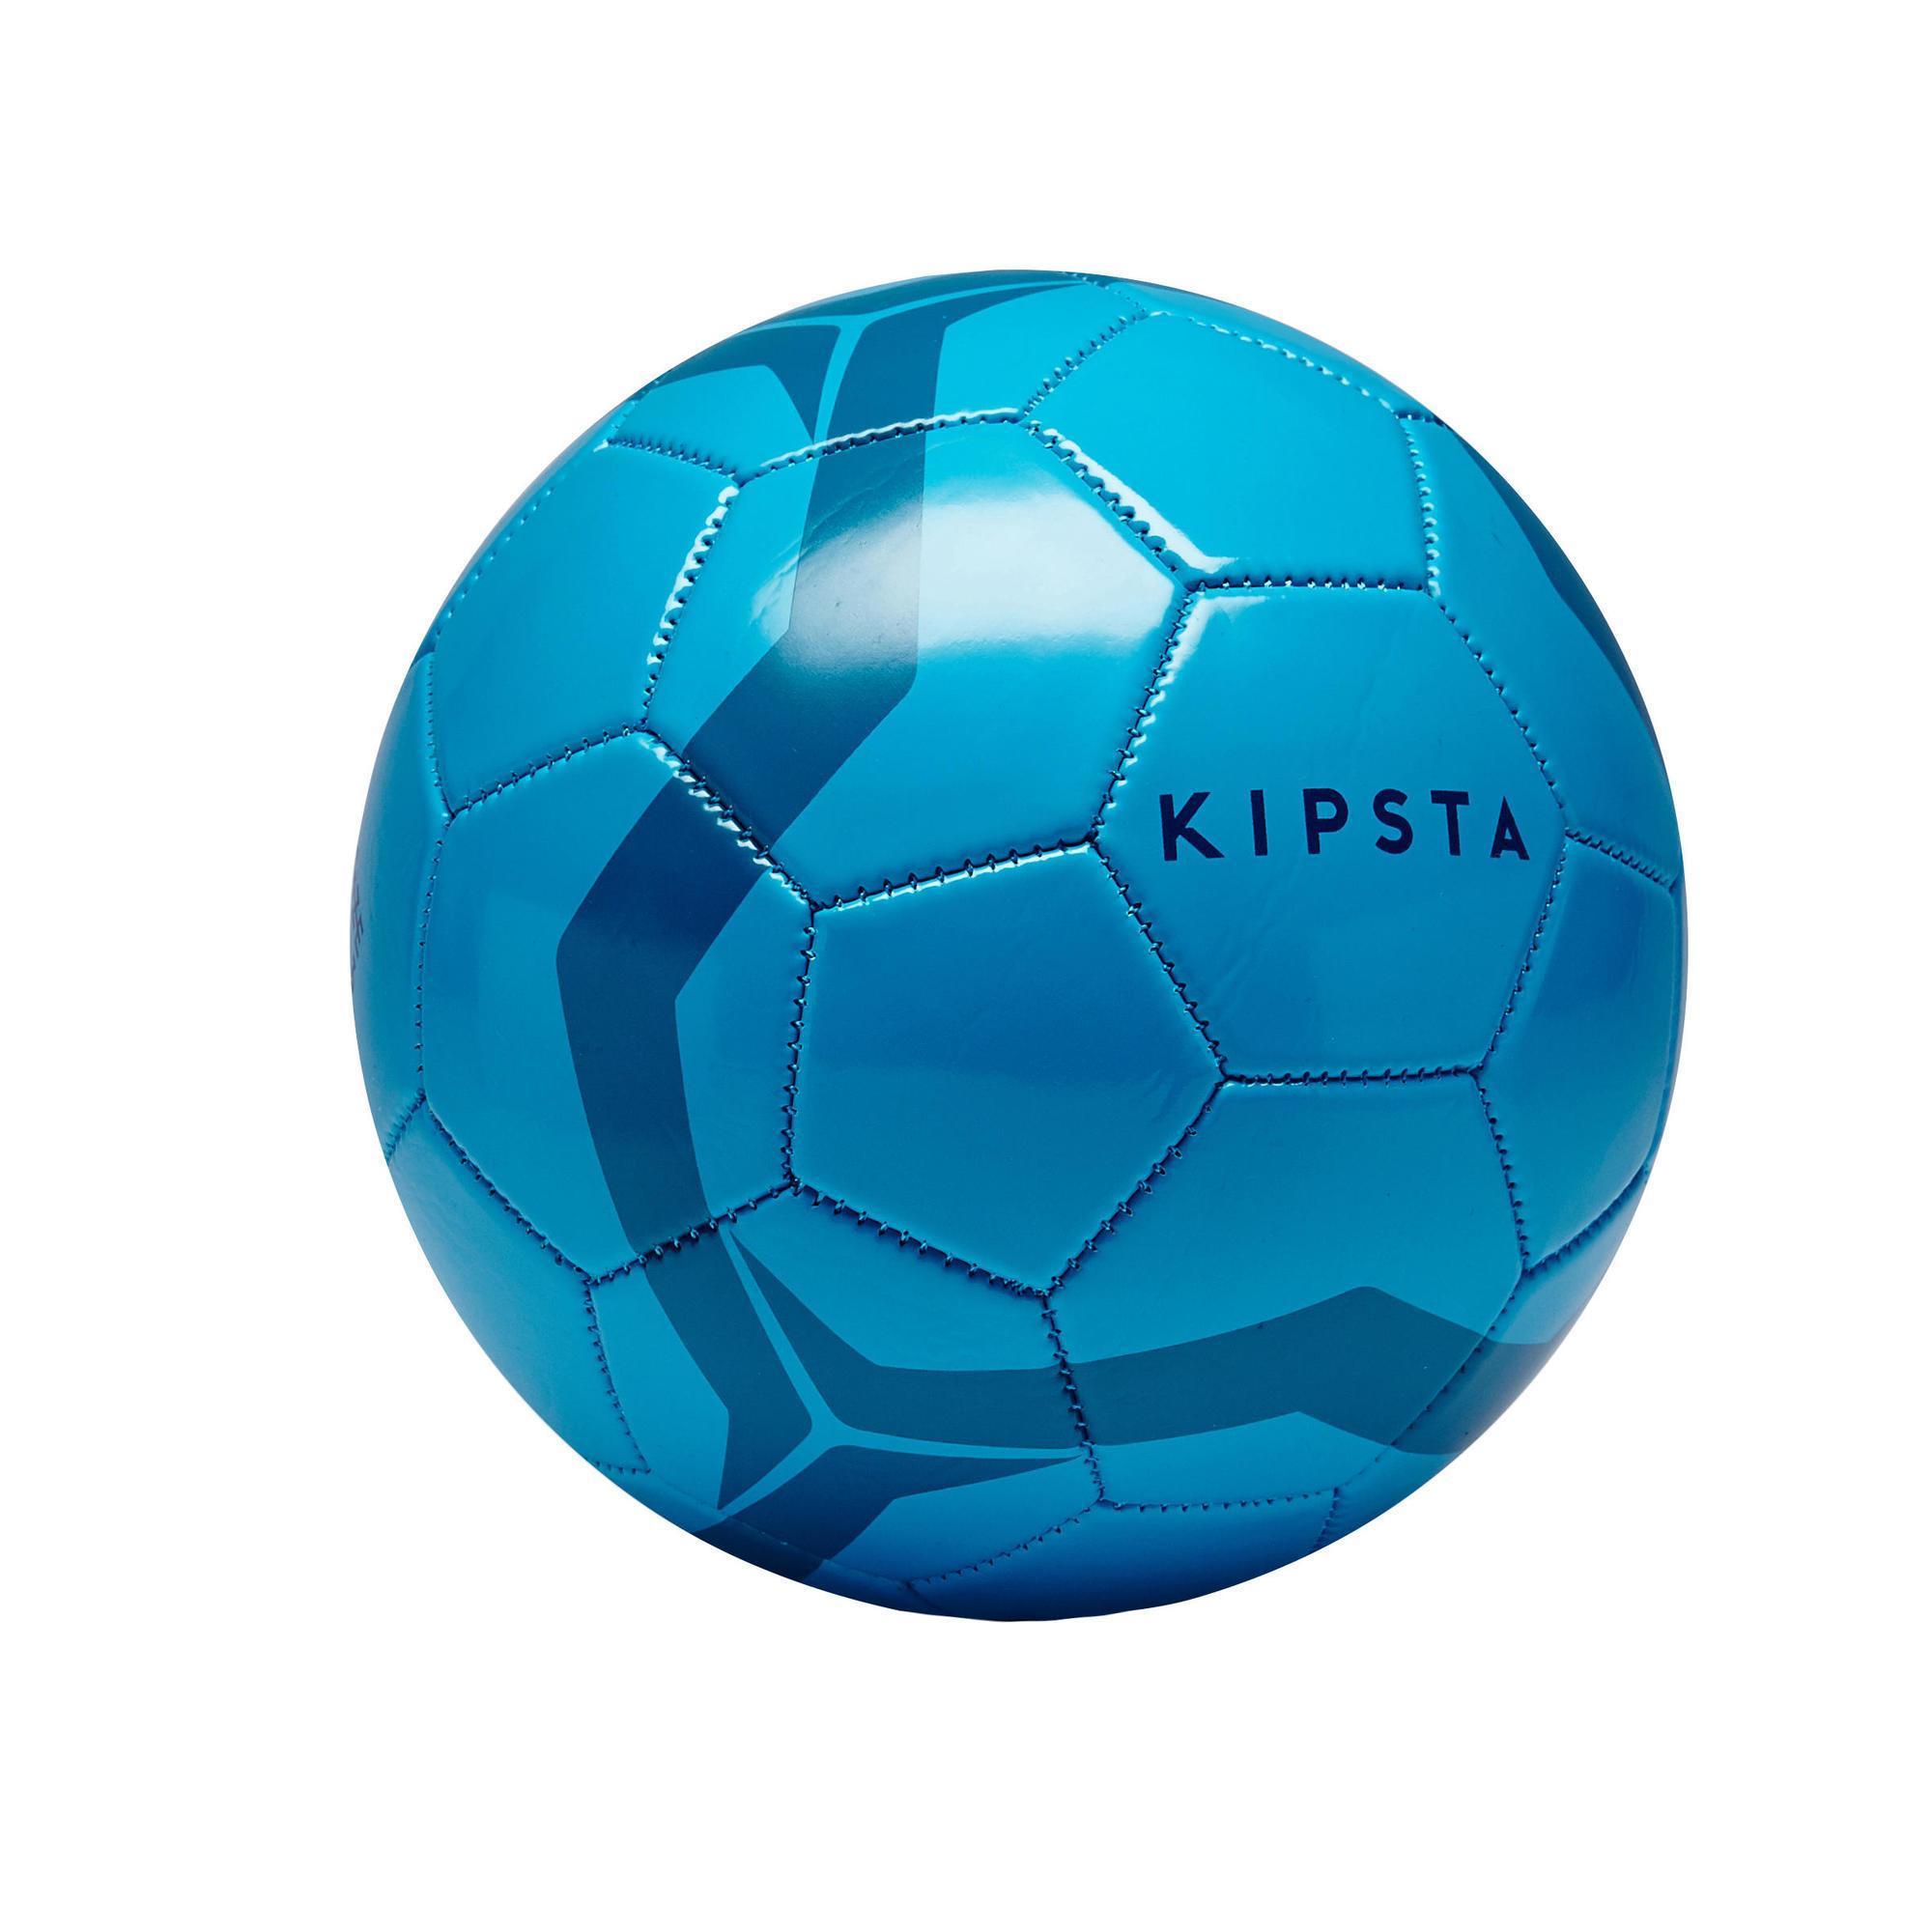 2f0faf4f1e2 Kipsta Voetbal First Kick maat 3 (tot 8 jaar) blauw | Decathlon.nl